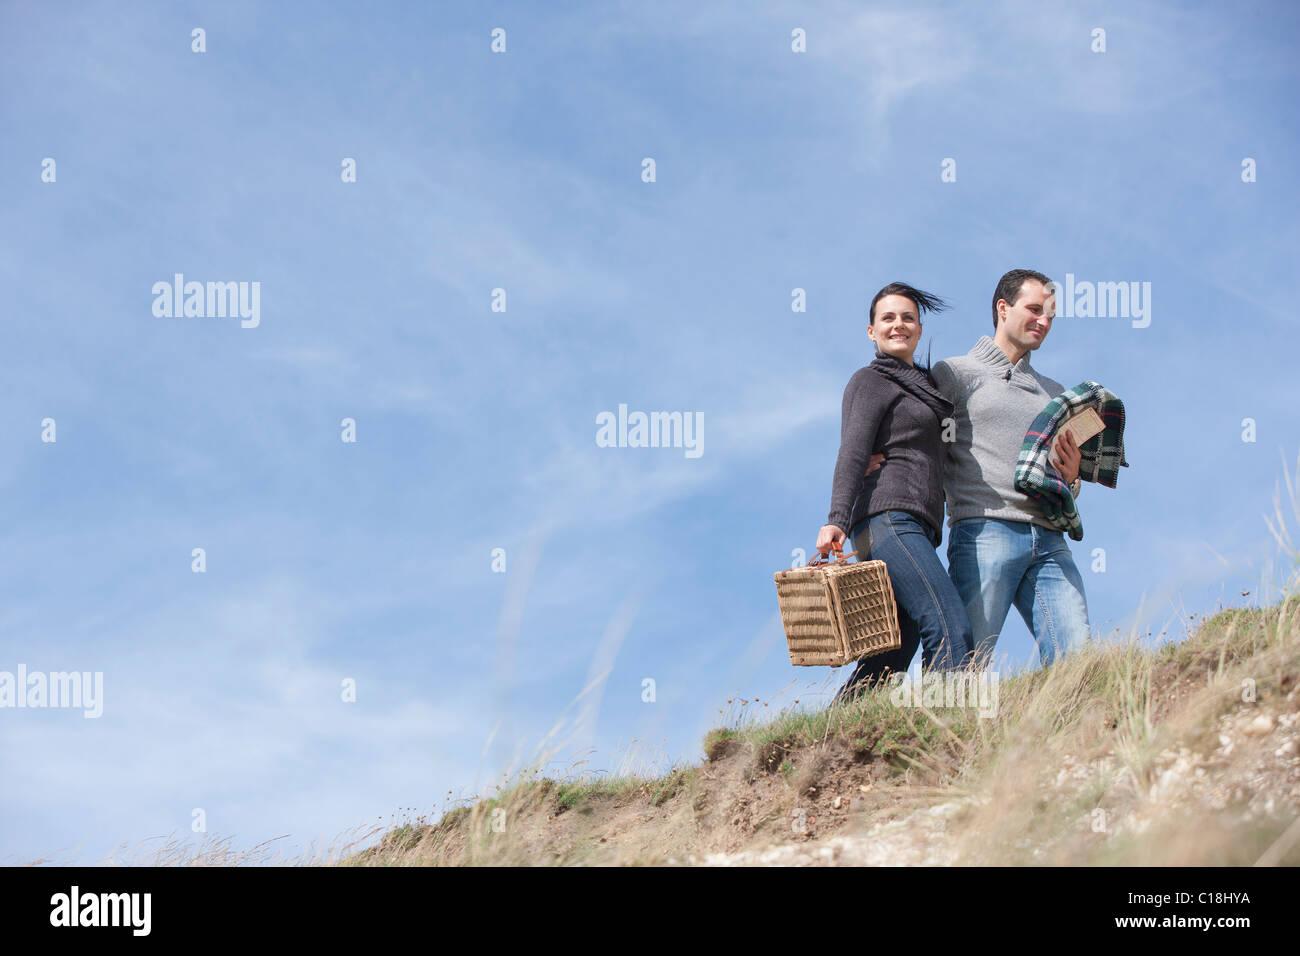 Paar bei einem Spaziergang Stockbild